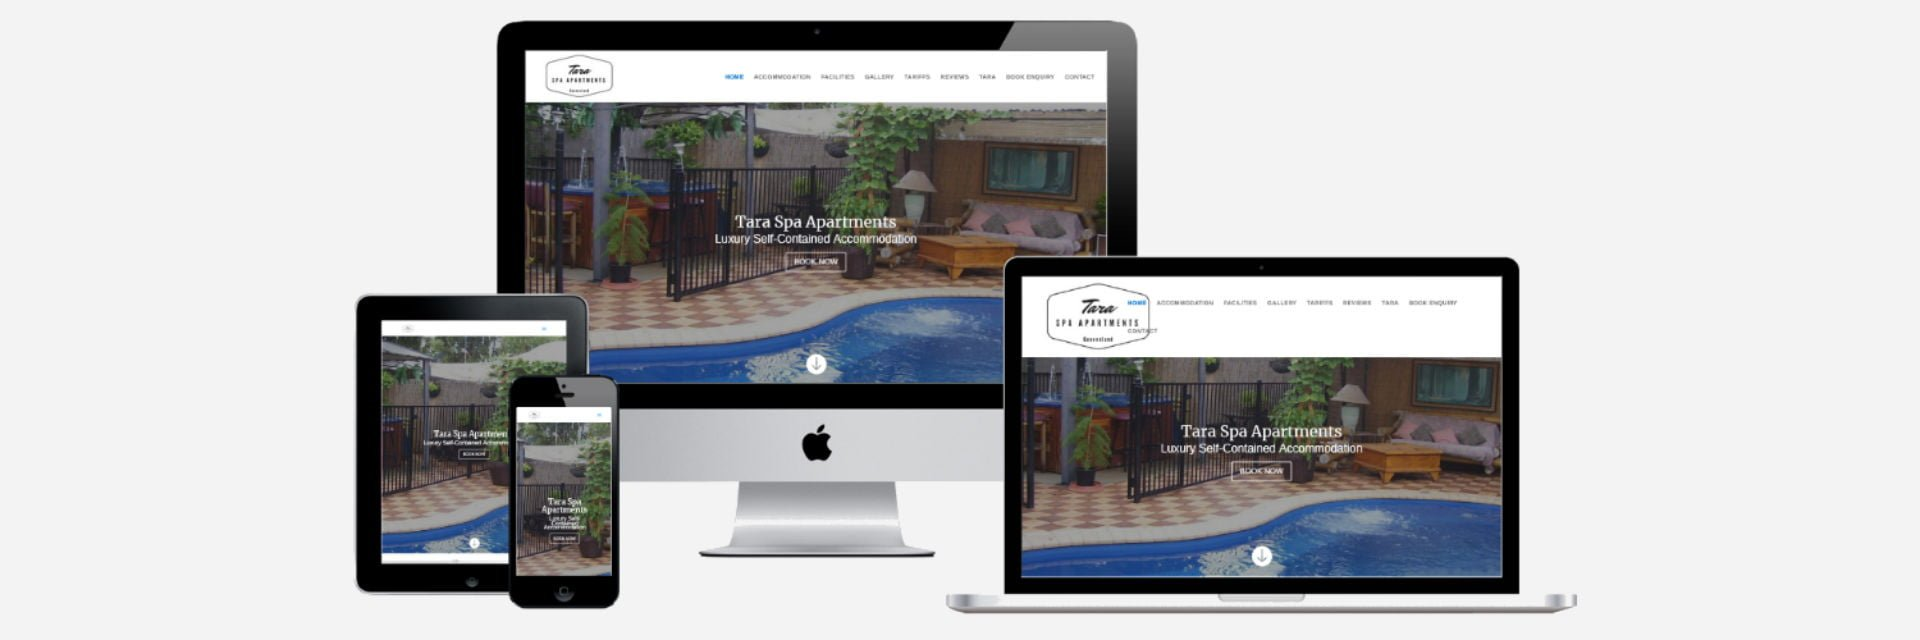 Tara Spa Apartments - Website Design